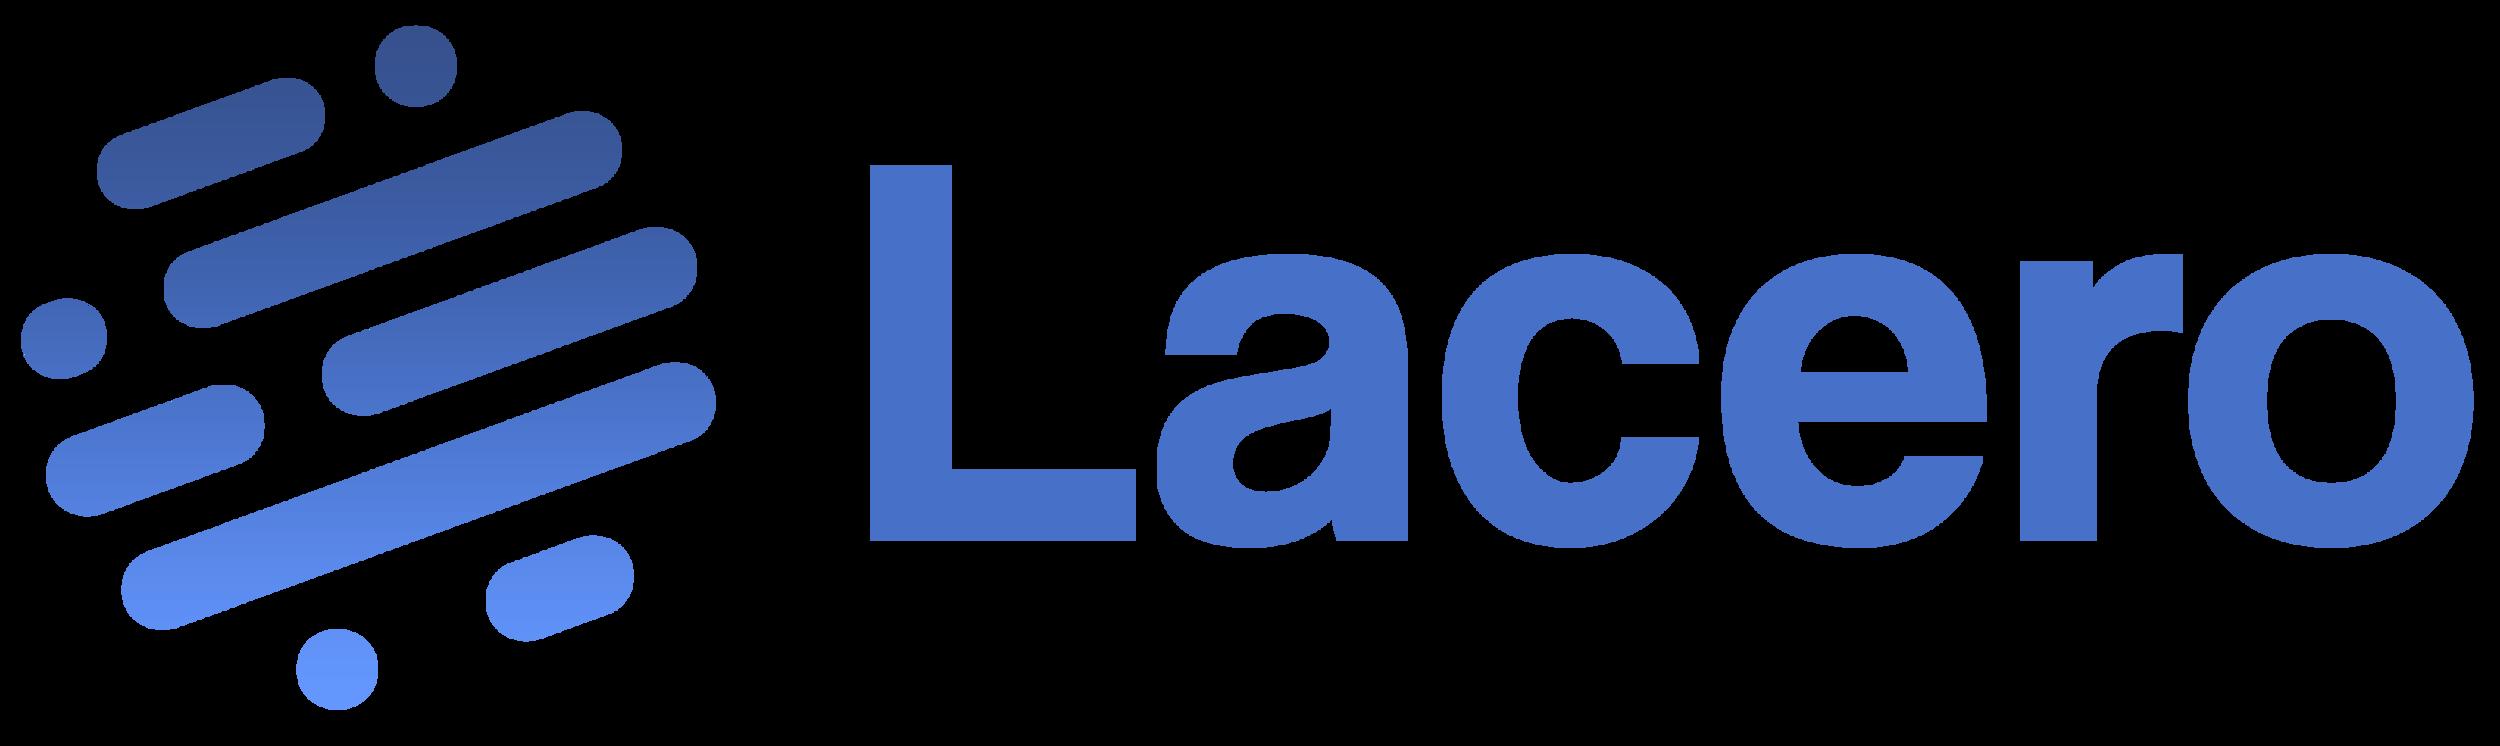 lacero-logo-300.png